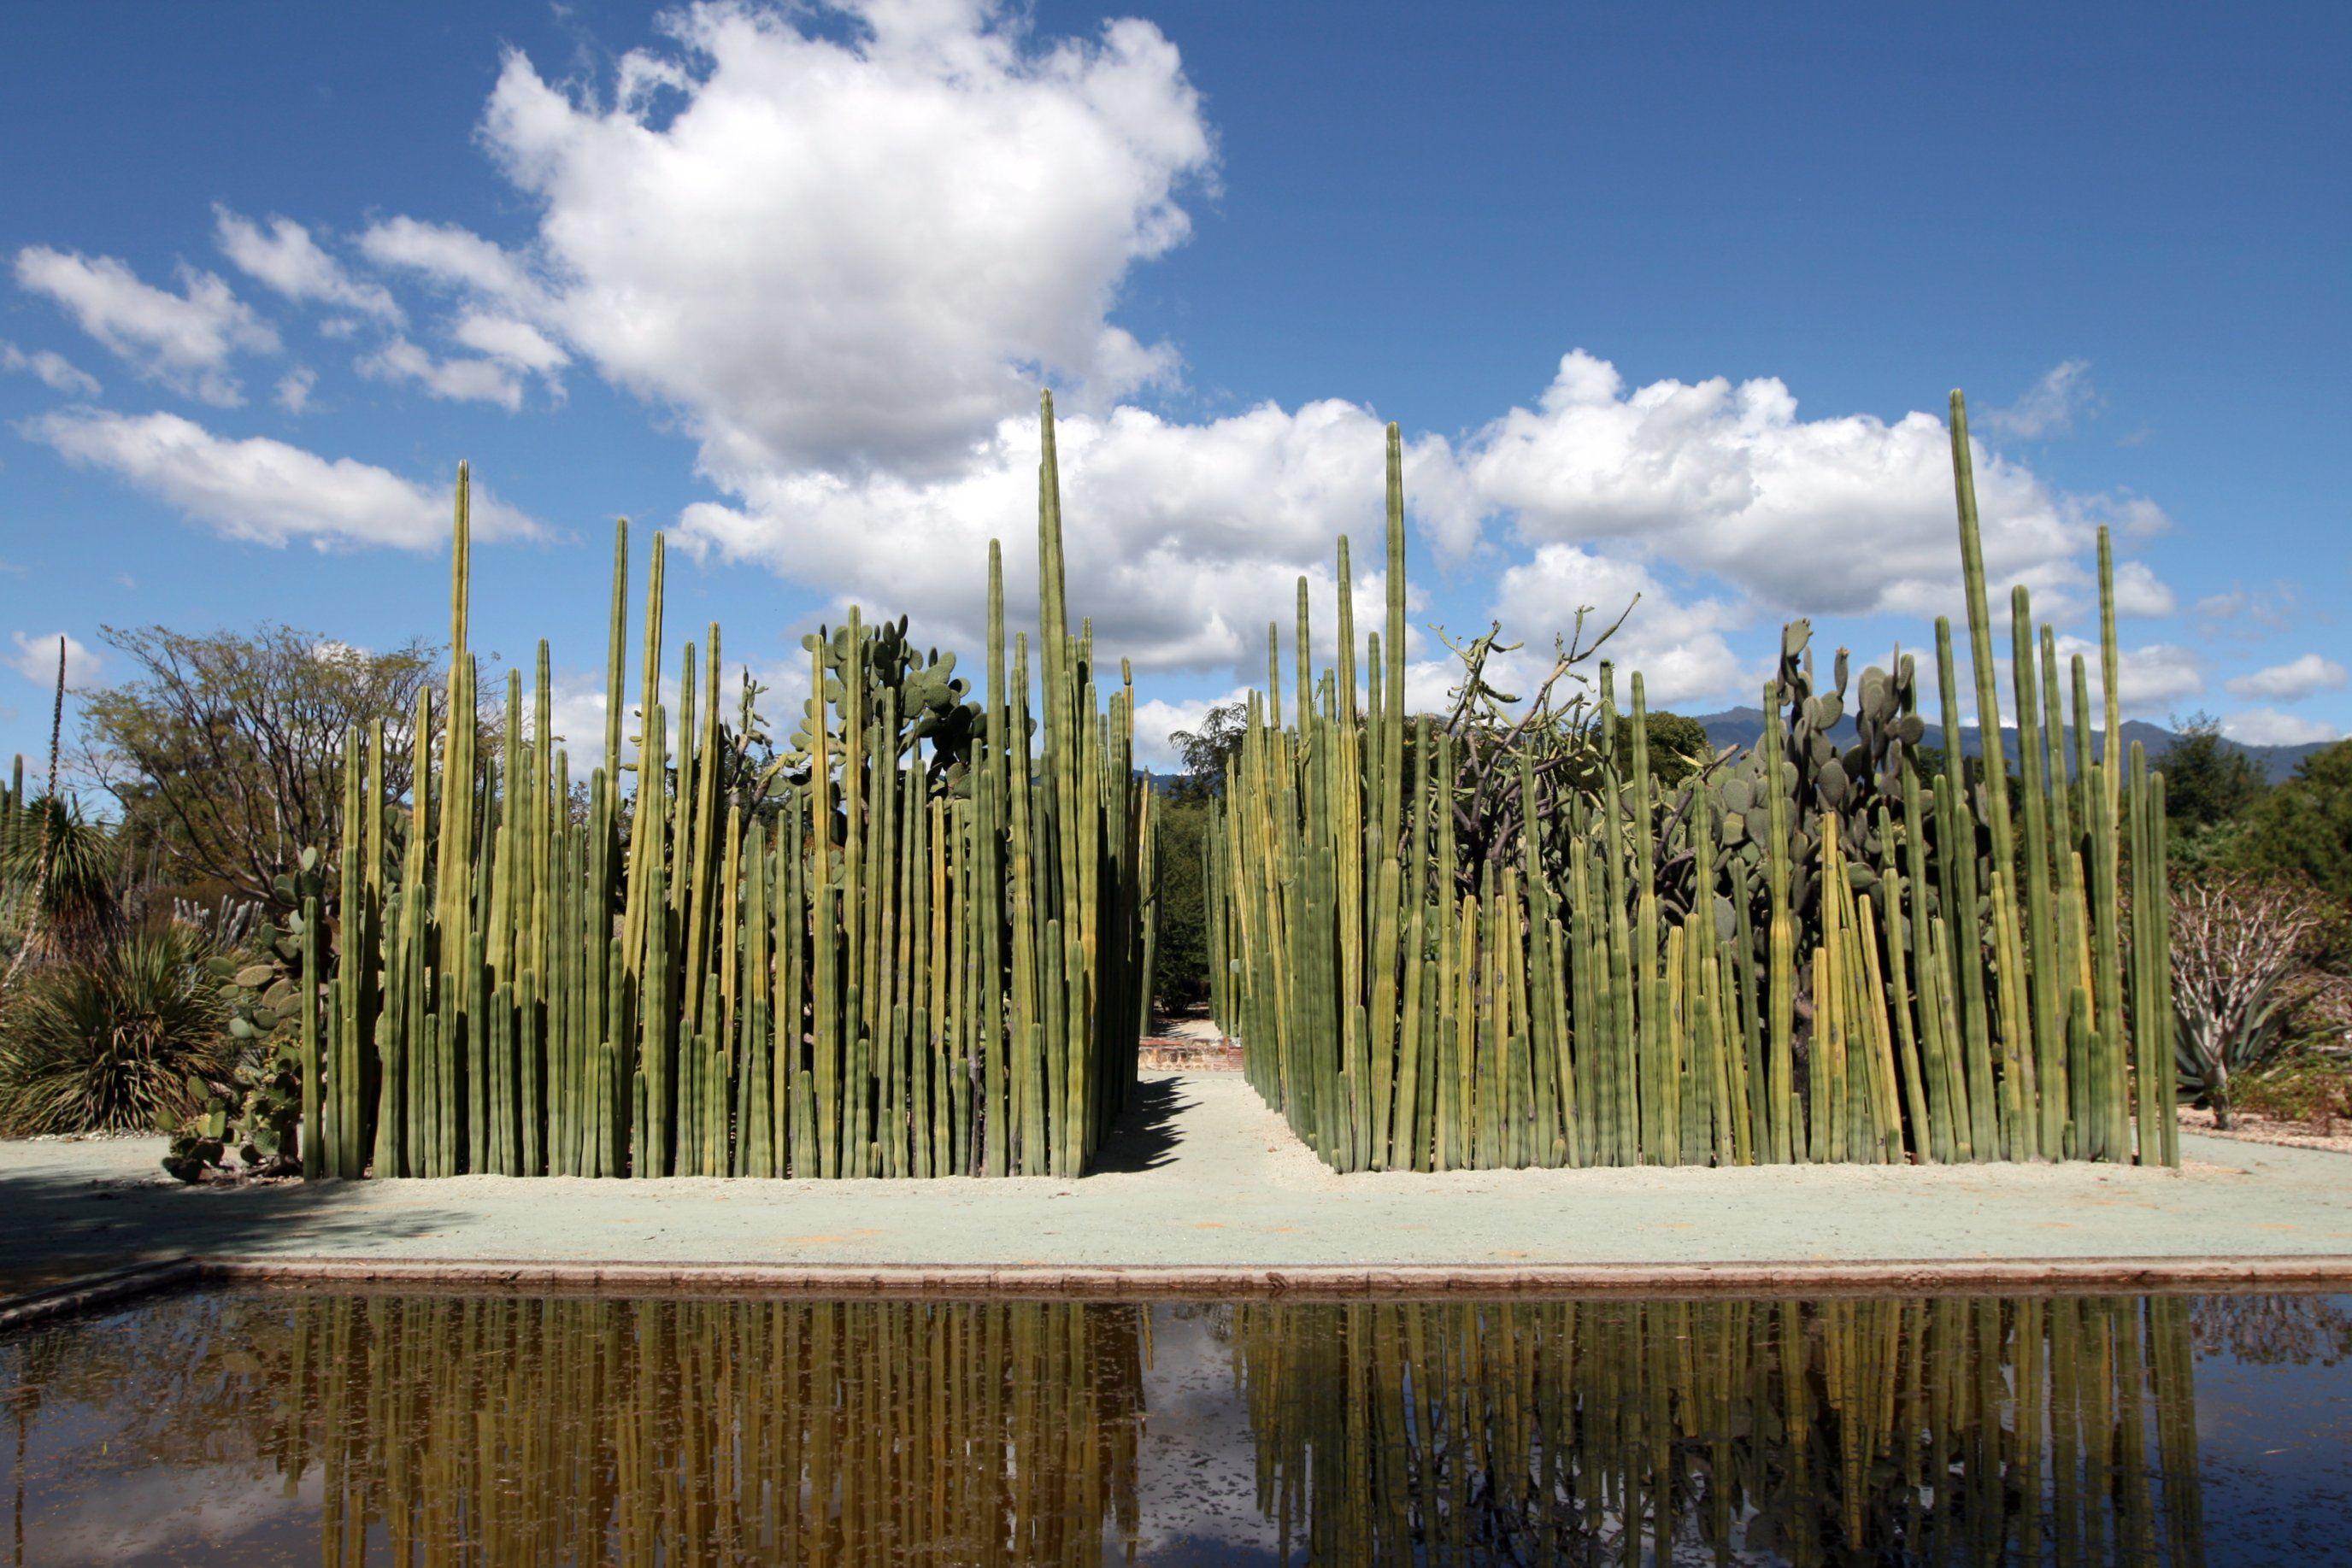 Jardin etnobotanico oaxaca mexico photography for Jardin etnobotanico oaxaca